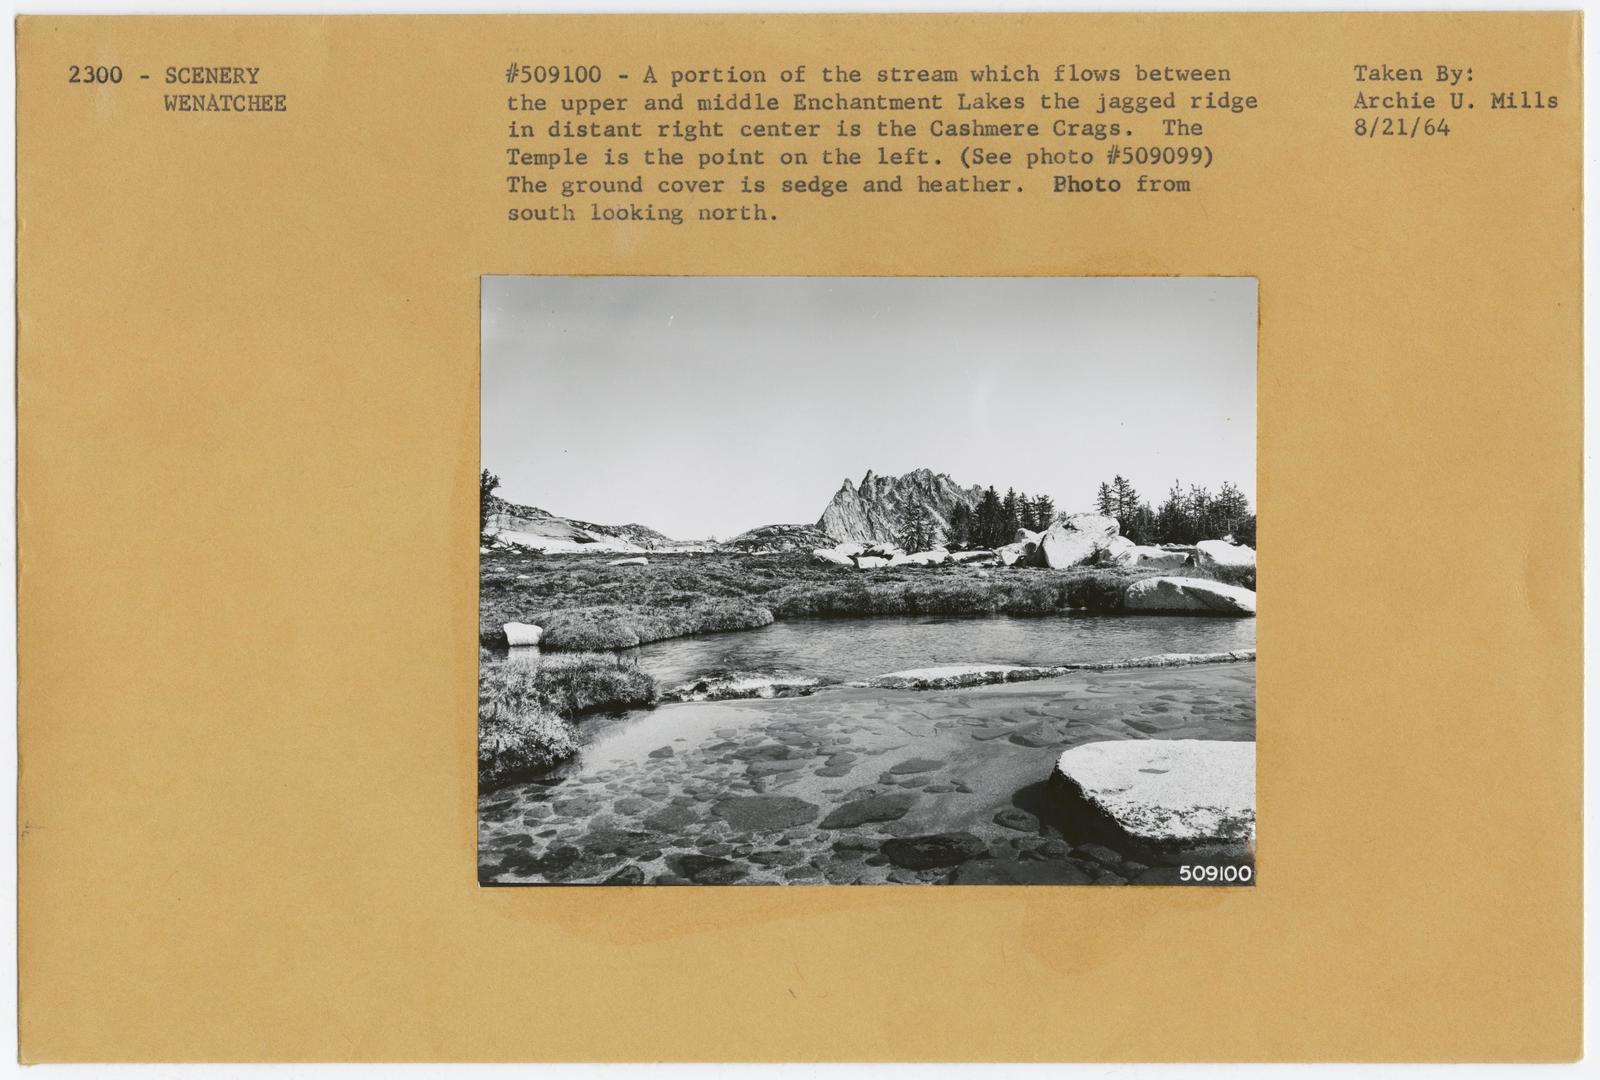 Scenery: Landscapes